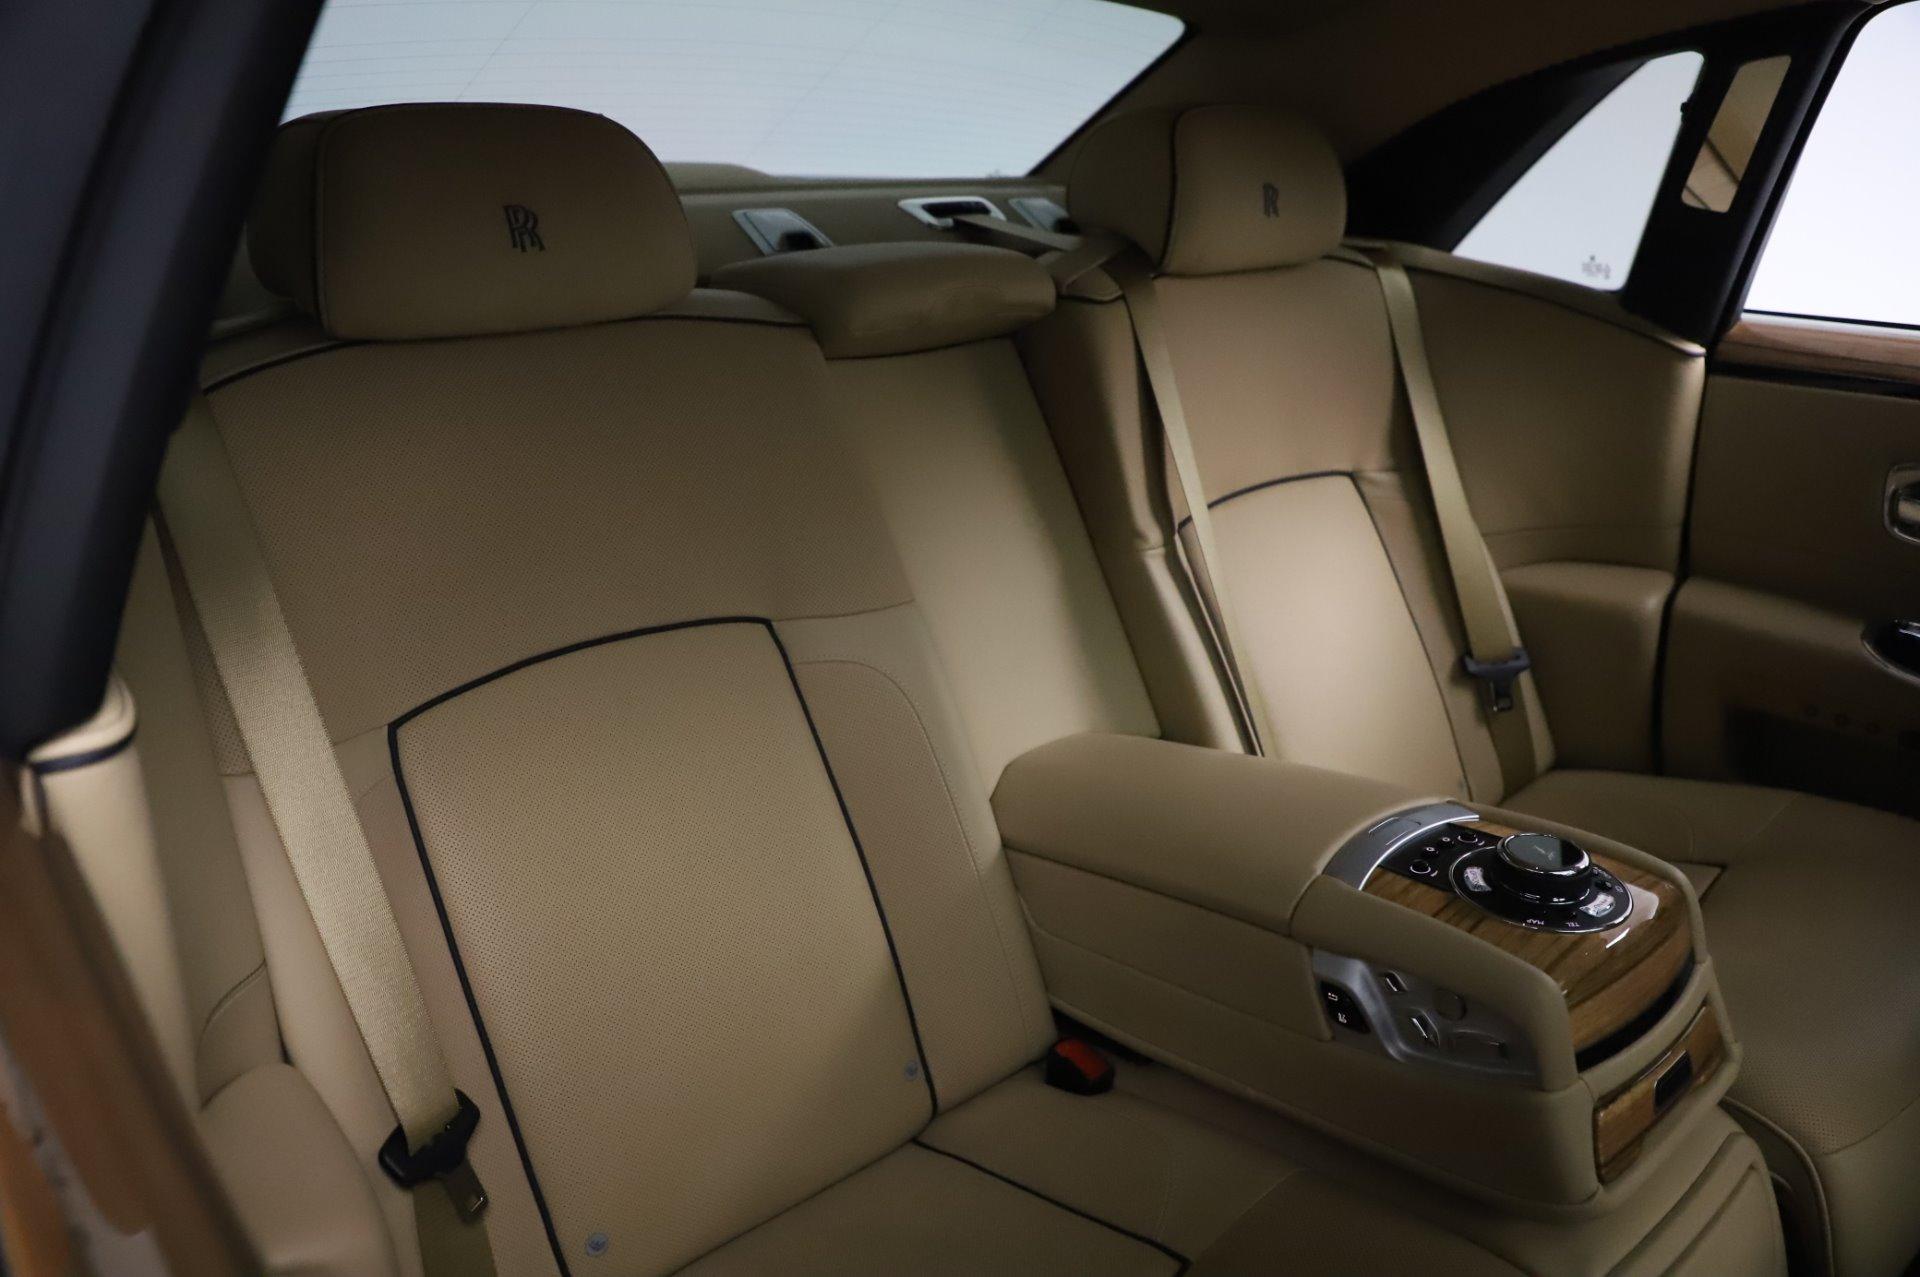 Used 2014 Rolls-Royce Ghost V-Spec For Sale In Westport, CT 858_p13